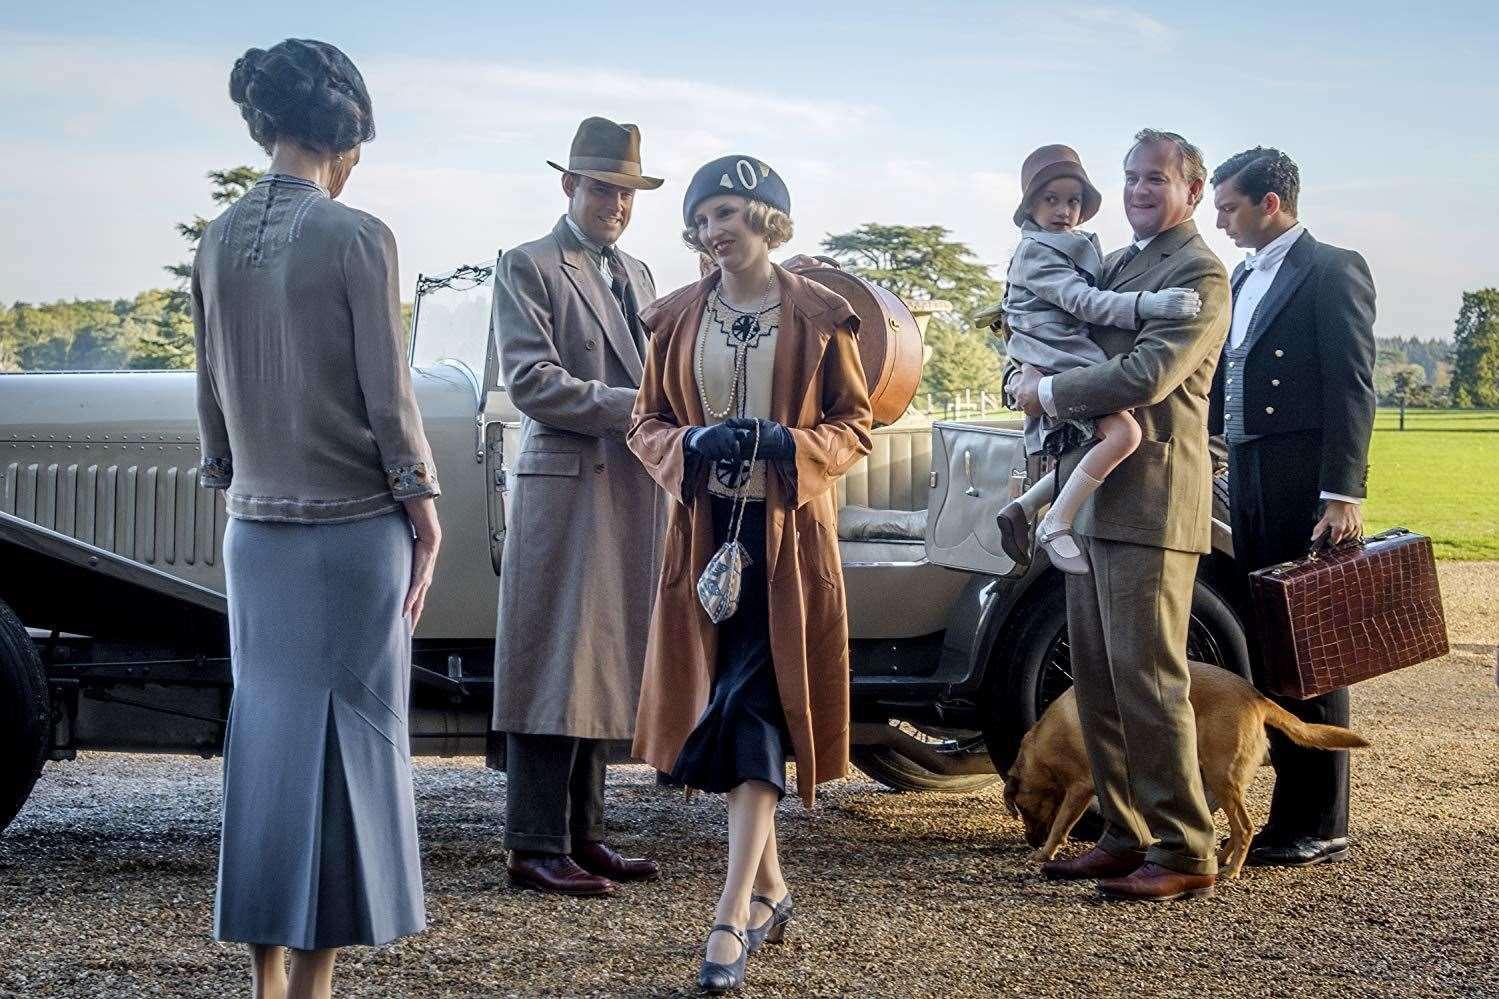 Elizabeth McGovern Hugh Bonneville Harry Hadden-Paton Laura Carmichael and Michael Fox in the Downton Abbey movie